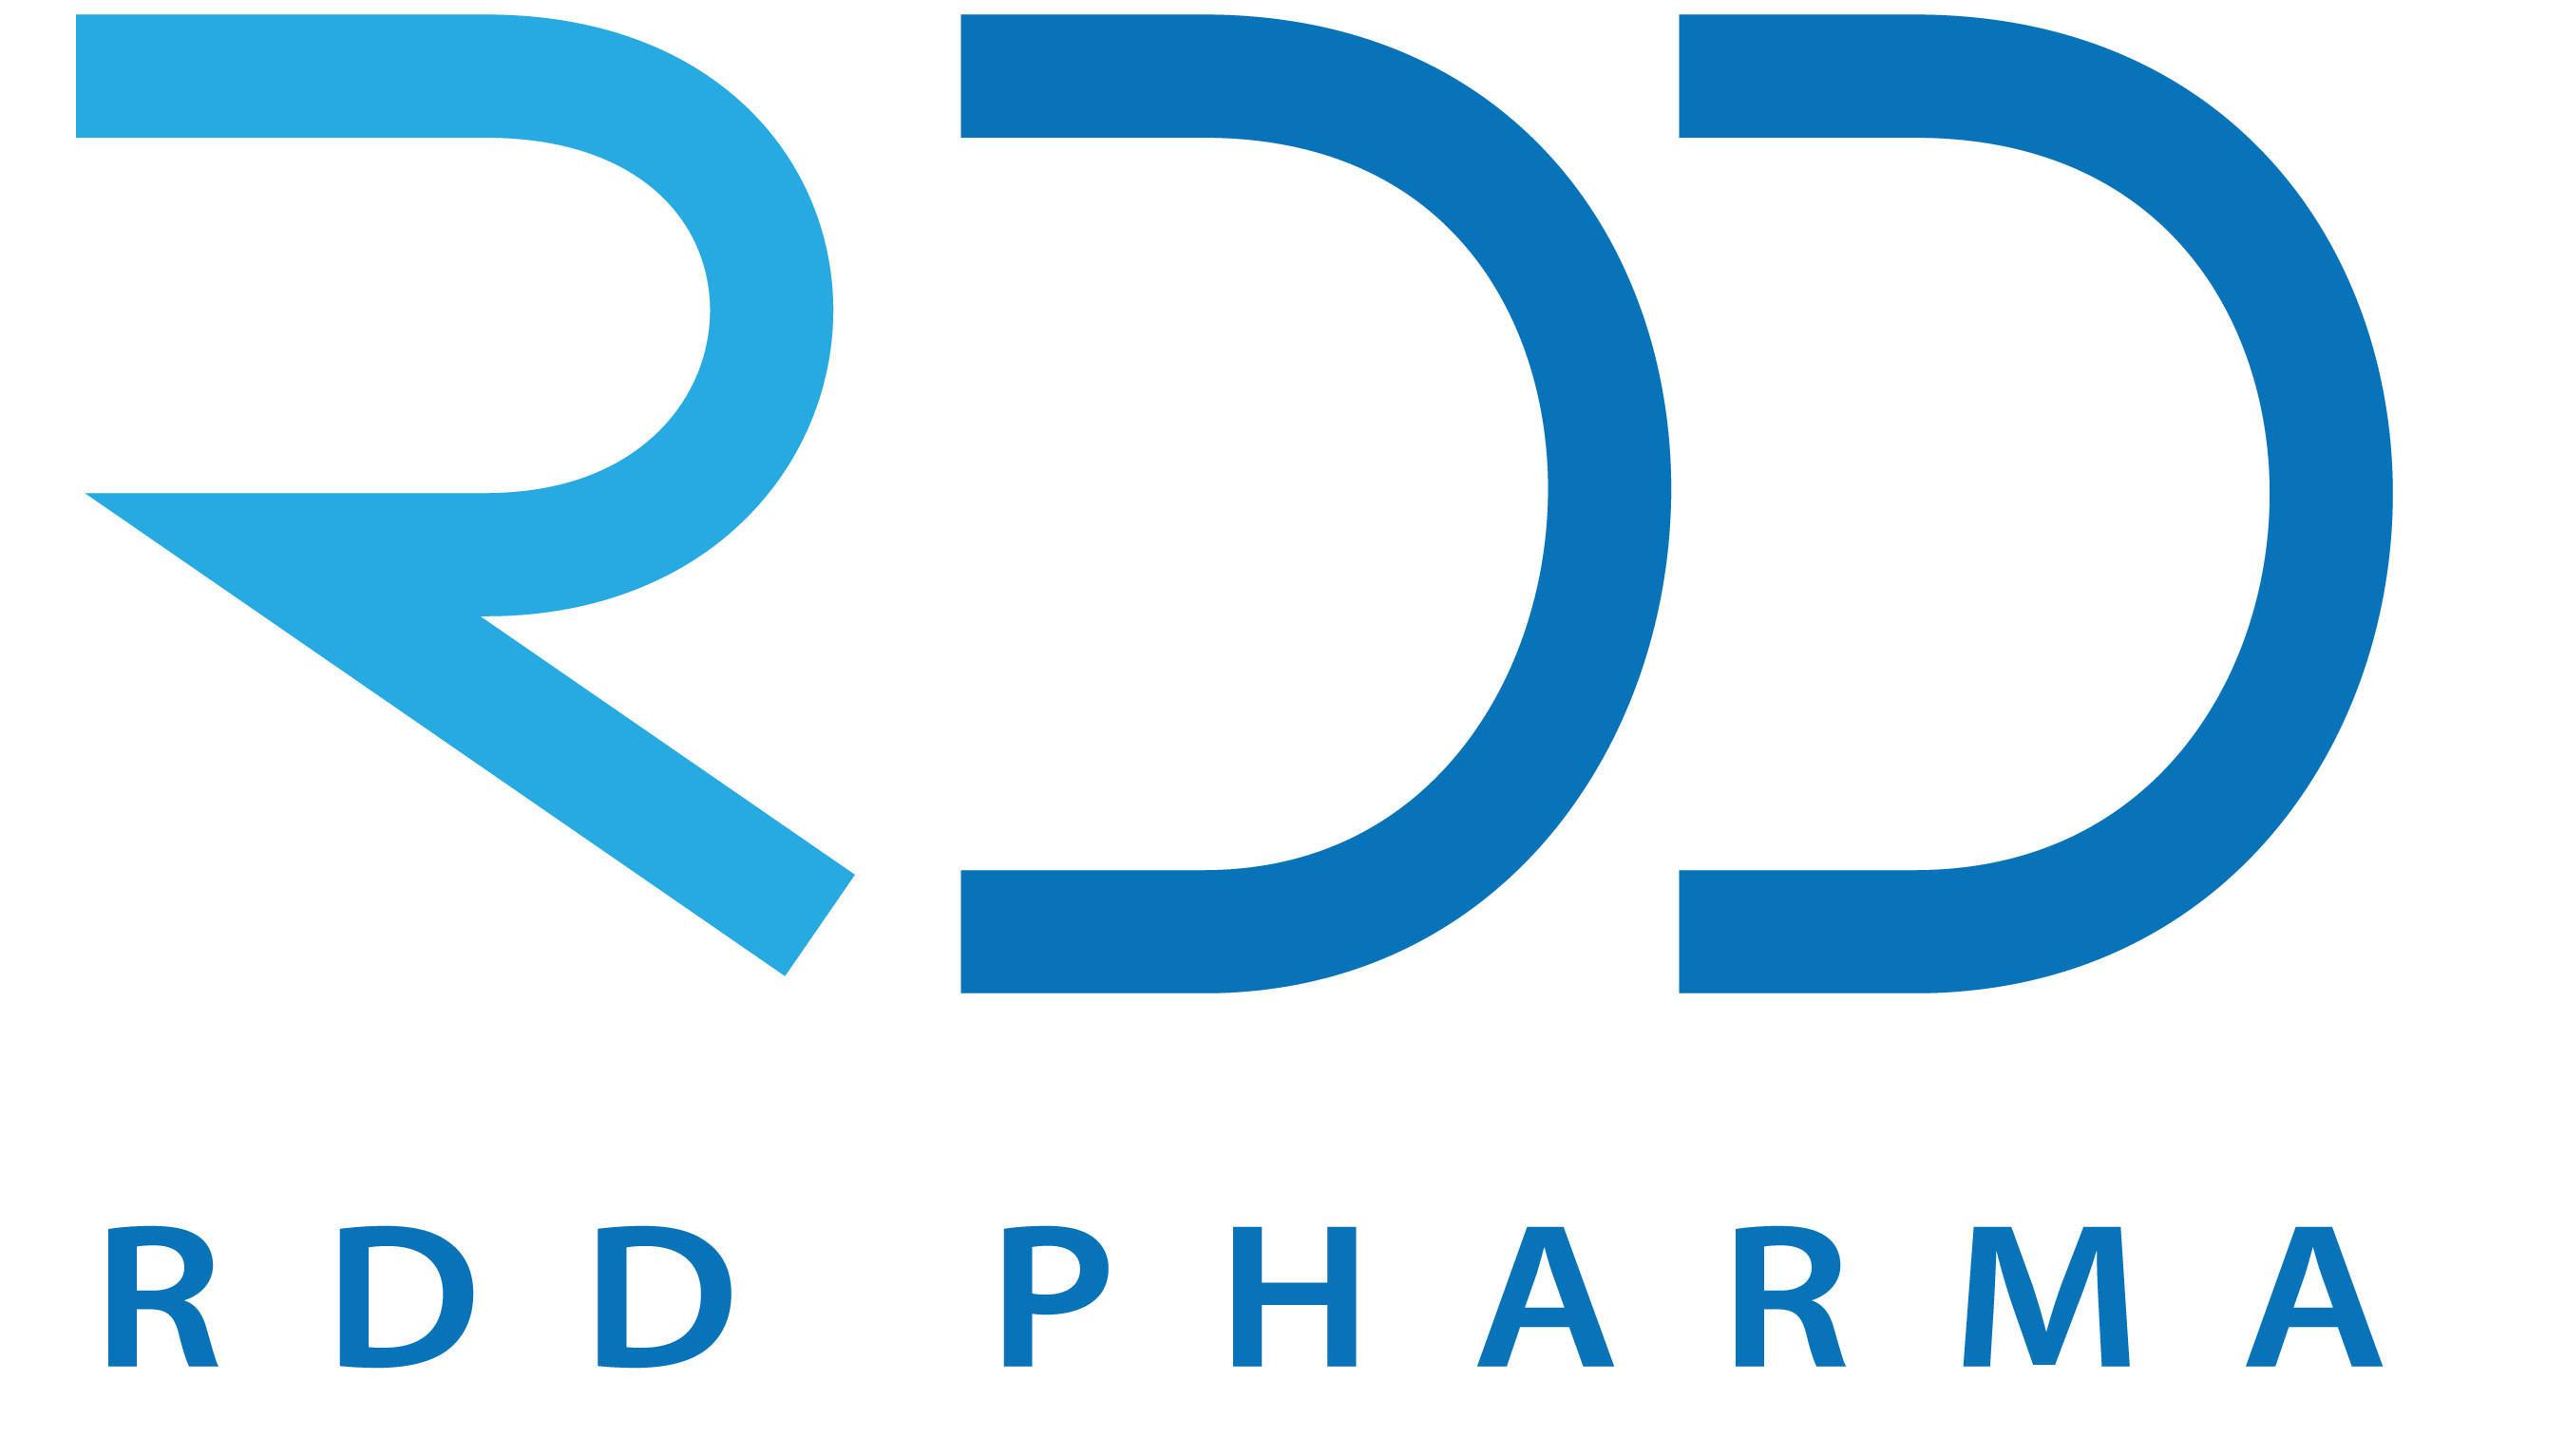 RDD Pharma logo